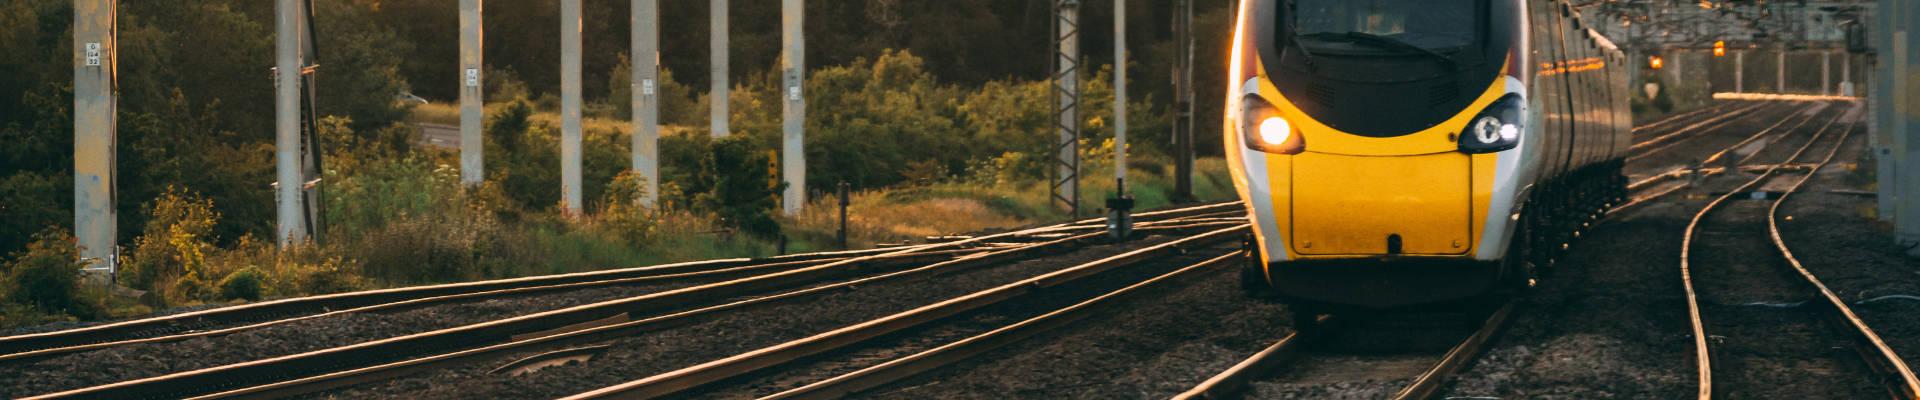 Train at sunset 1920x400